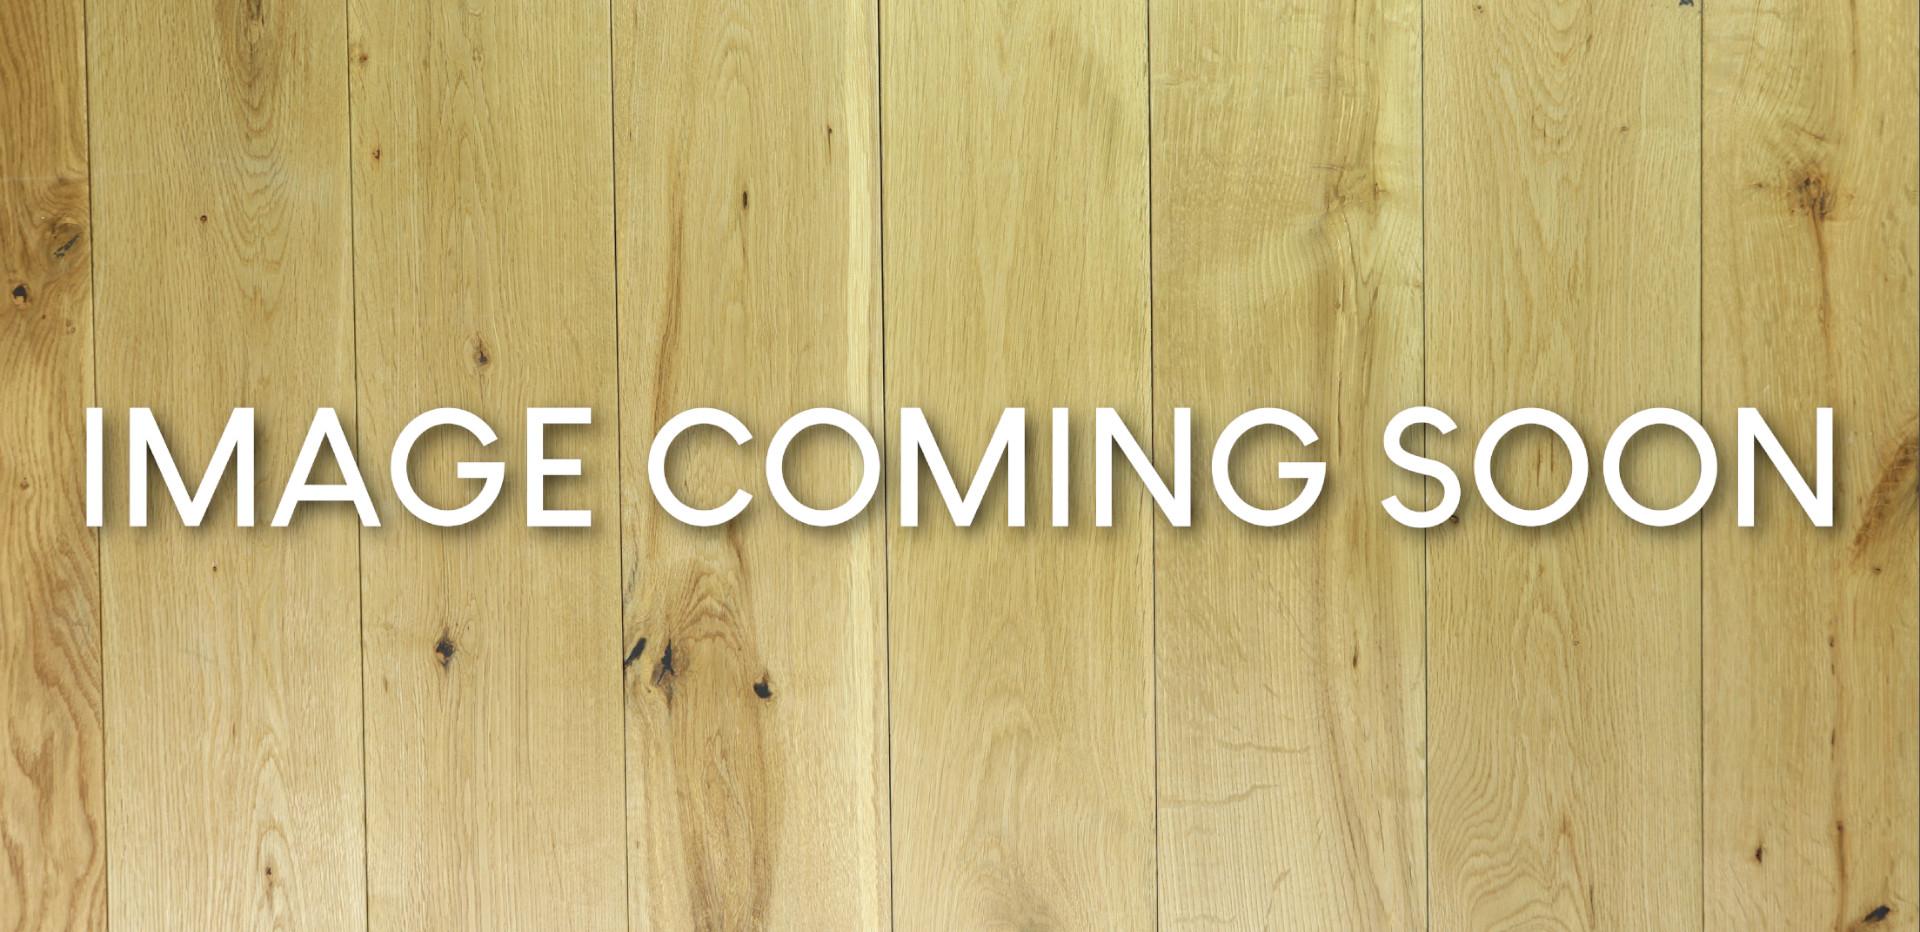 Fender Custom Shop Greg Fessler Masterbuilt 63 Strat Journeyman Relic Chocolate 3 Tone Sunburst R89050